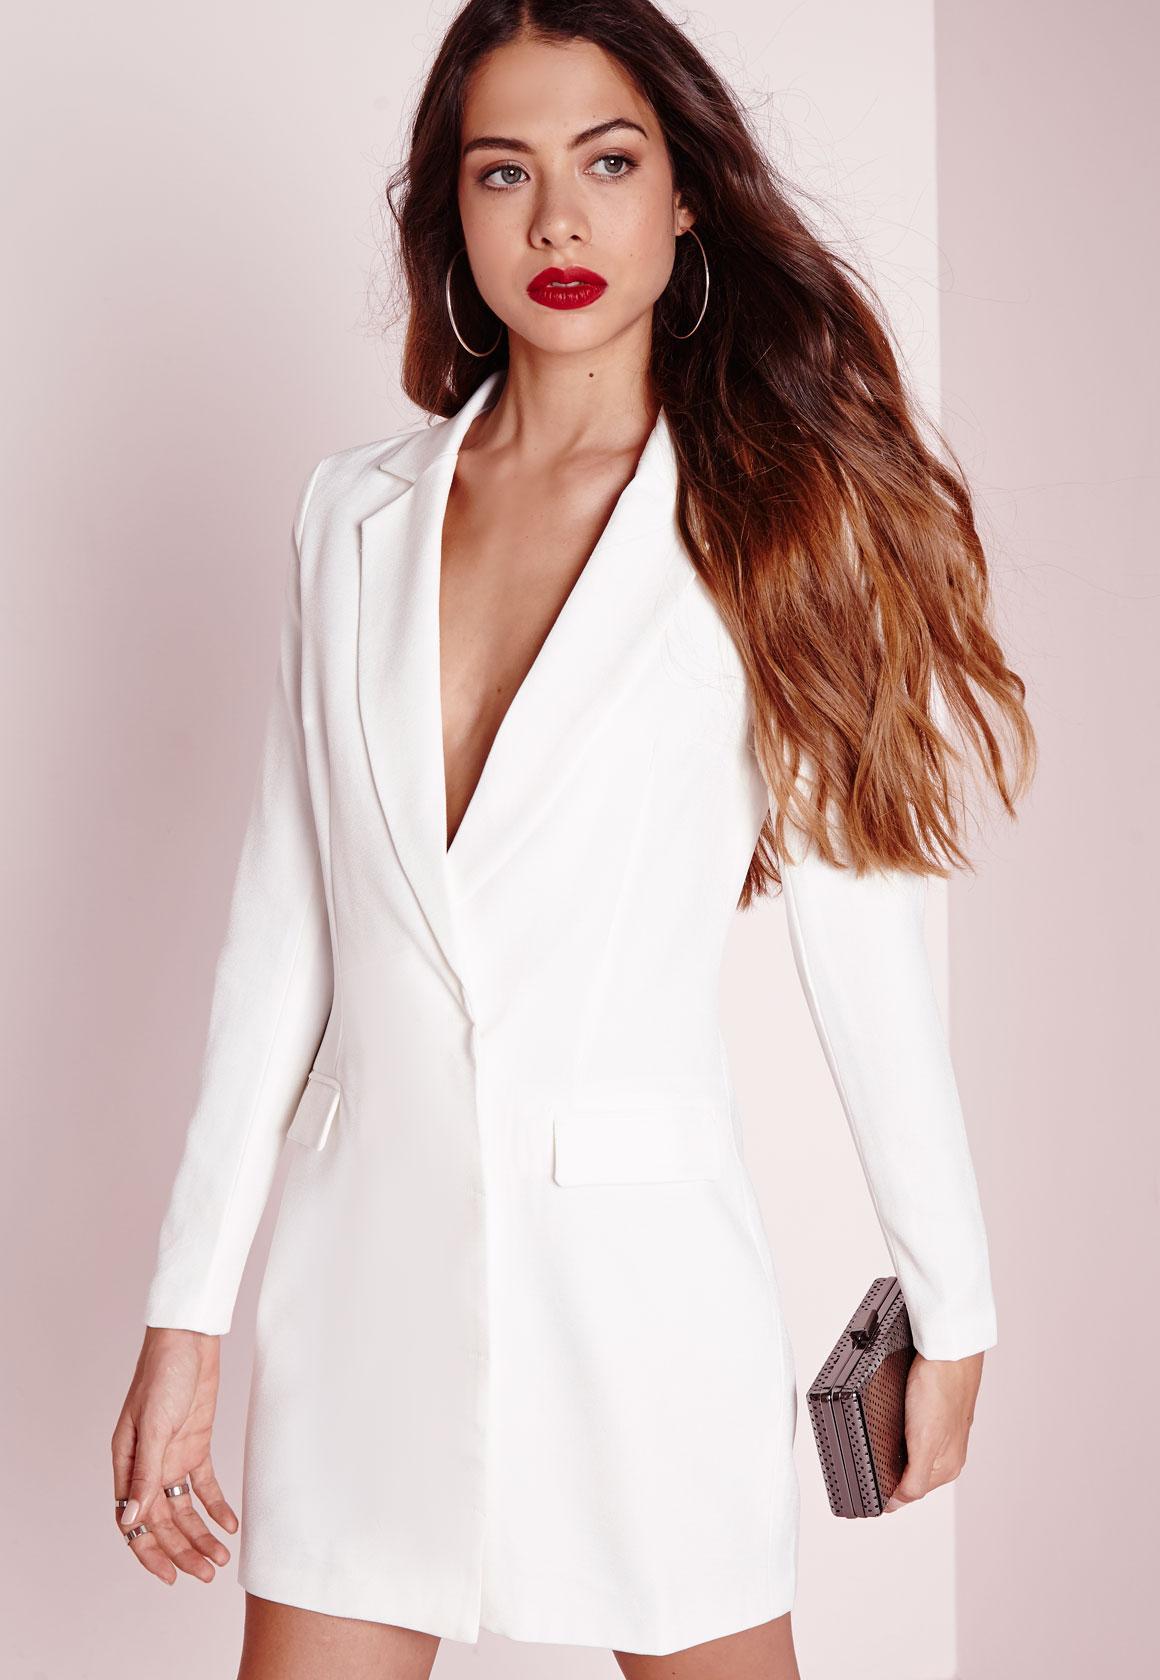 Stripe Blazer Dress - White Missguided Zhsnmf